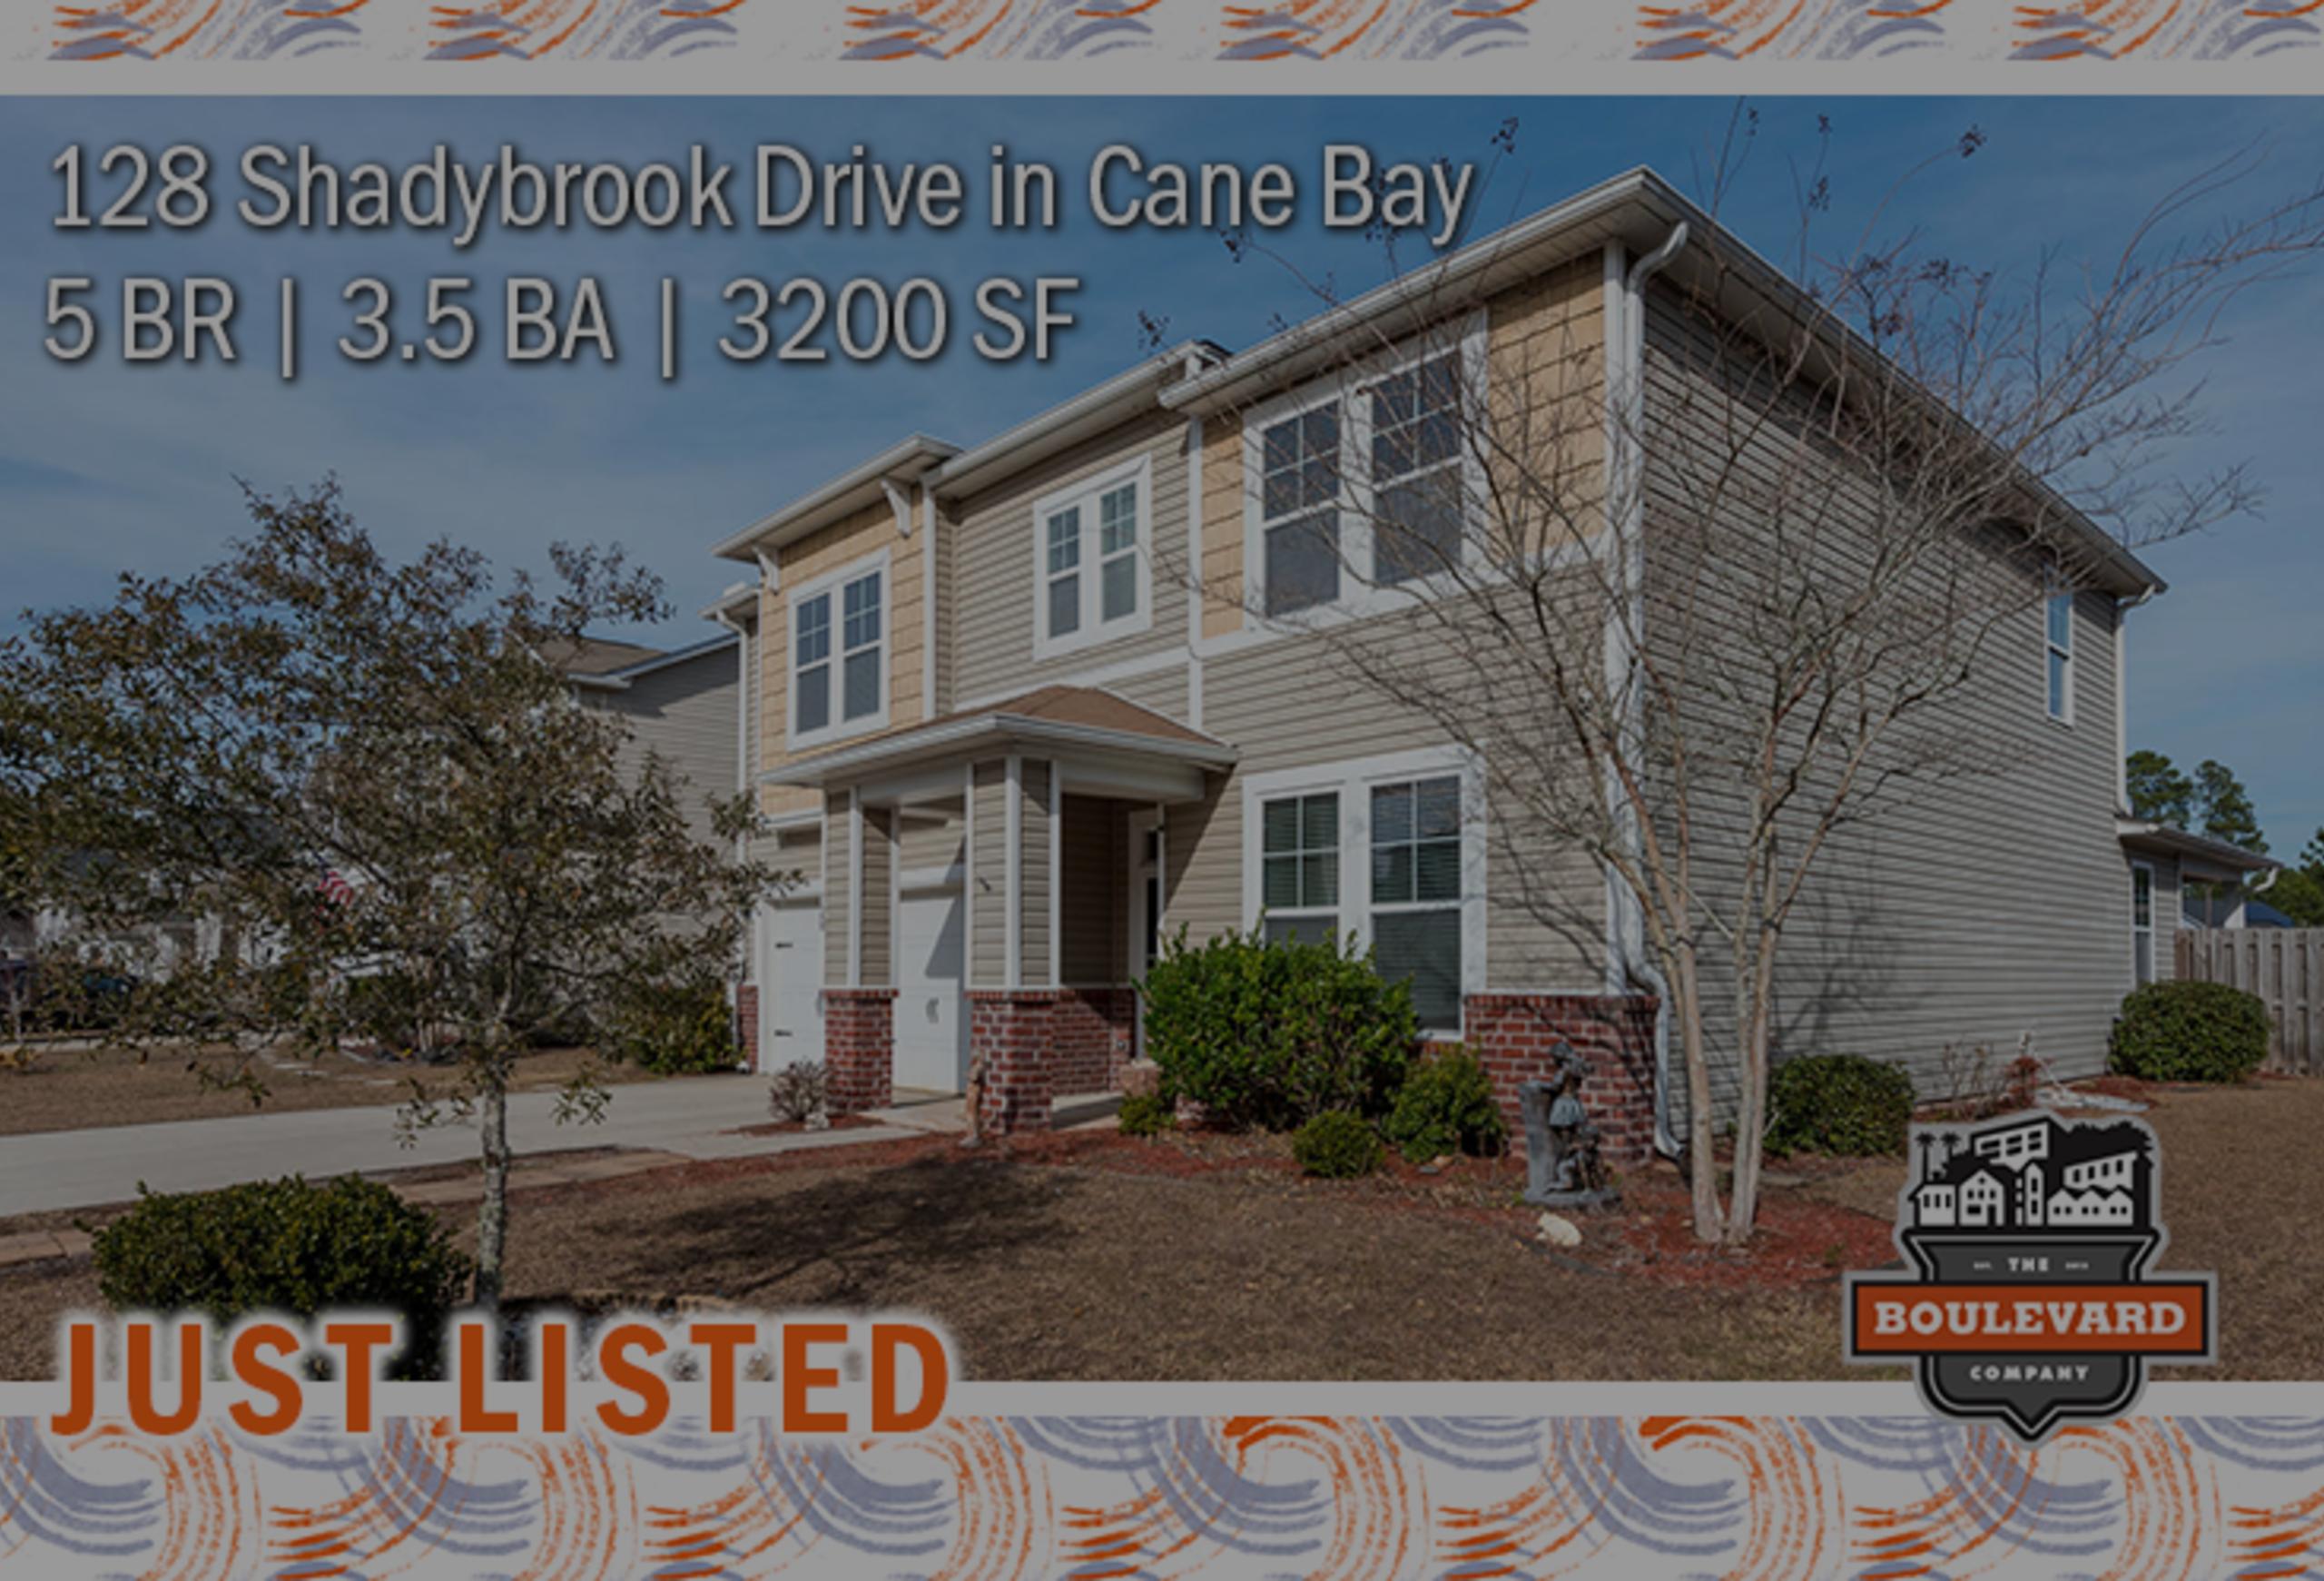 new listing: 128 Shadybrook Drive in Cane Bay Plantation